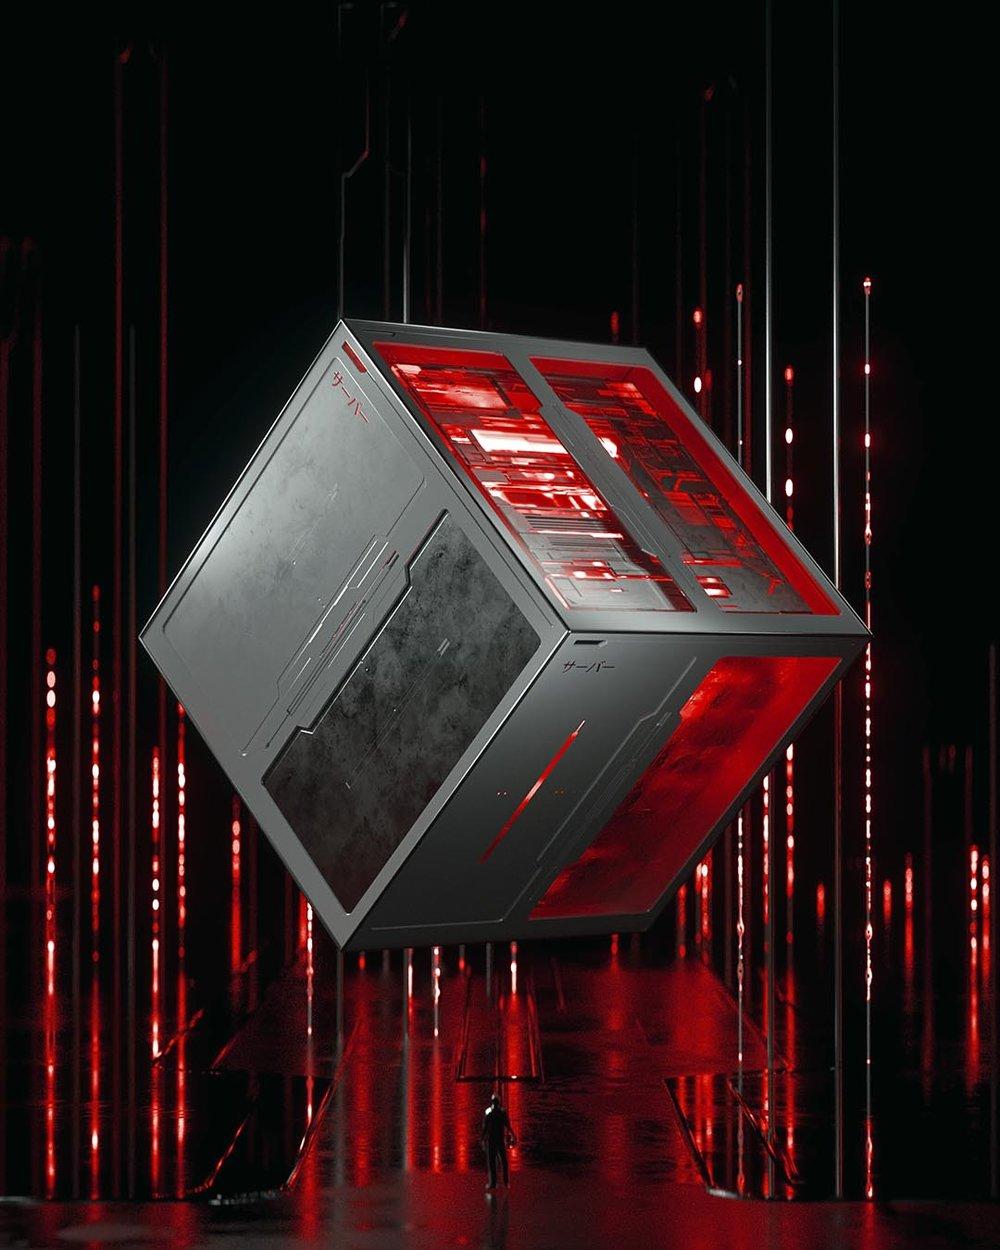 [25-11-17] - Main Server.jpg